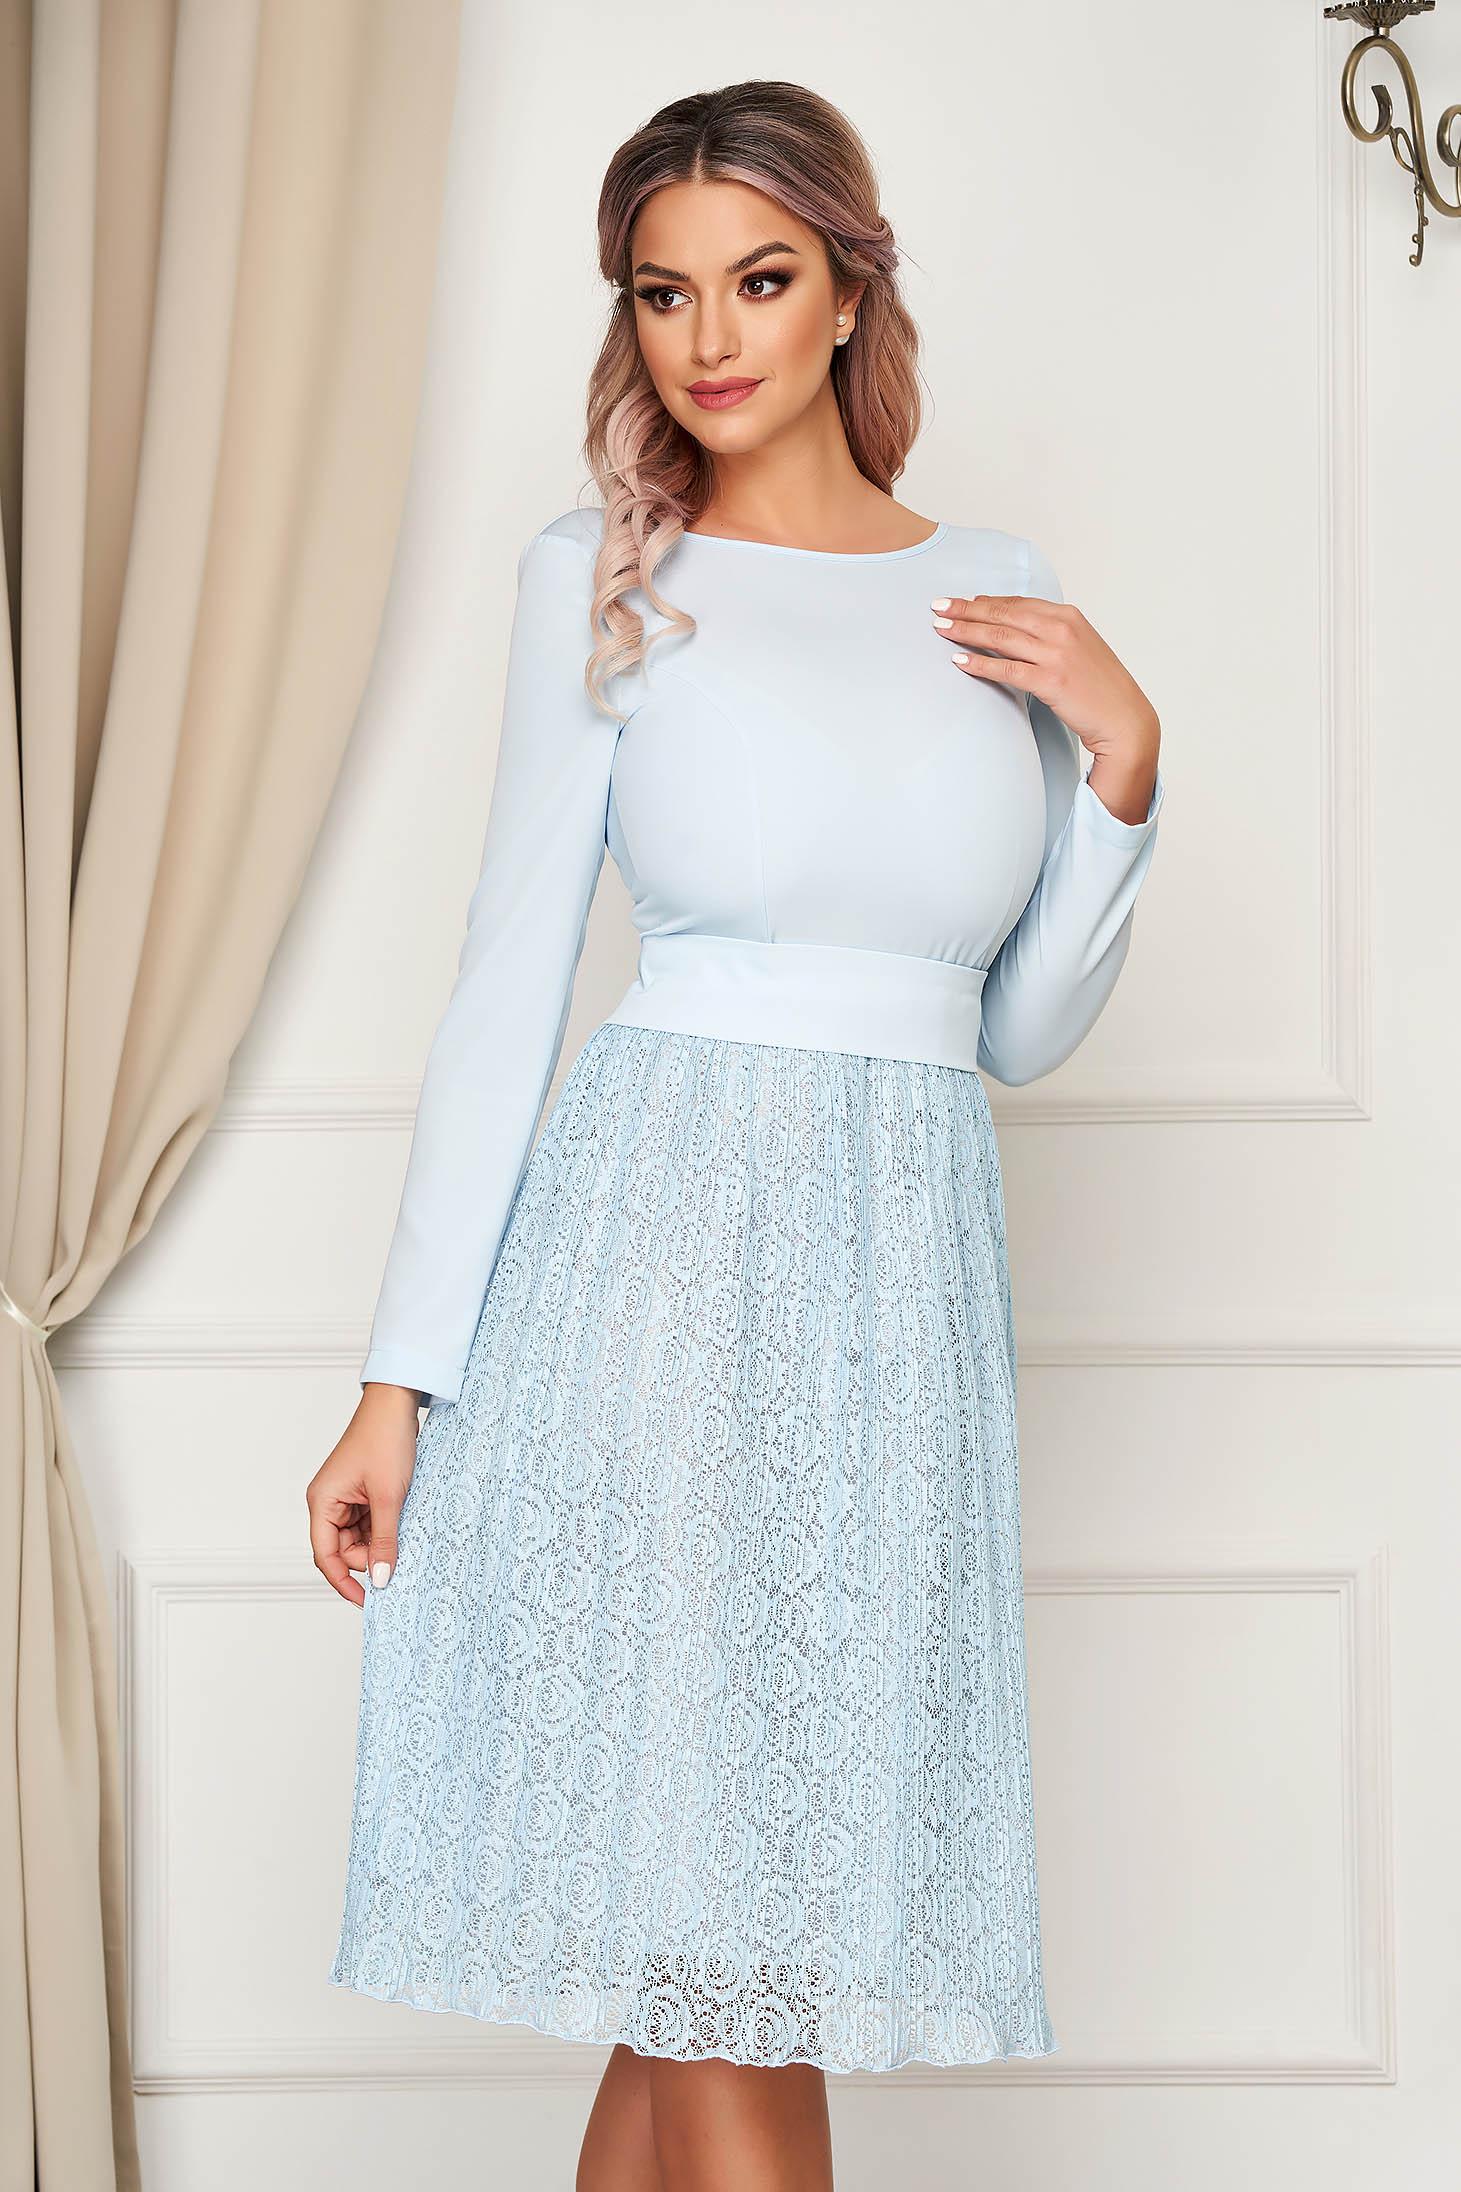 Rochie StarShinerS albastru-deschis eleganta midi in clos din dantela cu spatele decupat